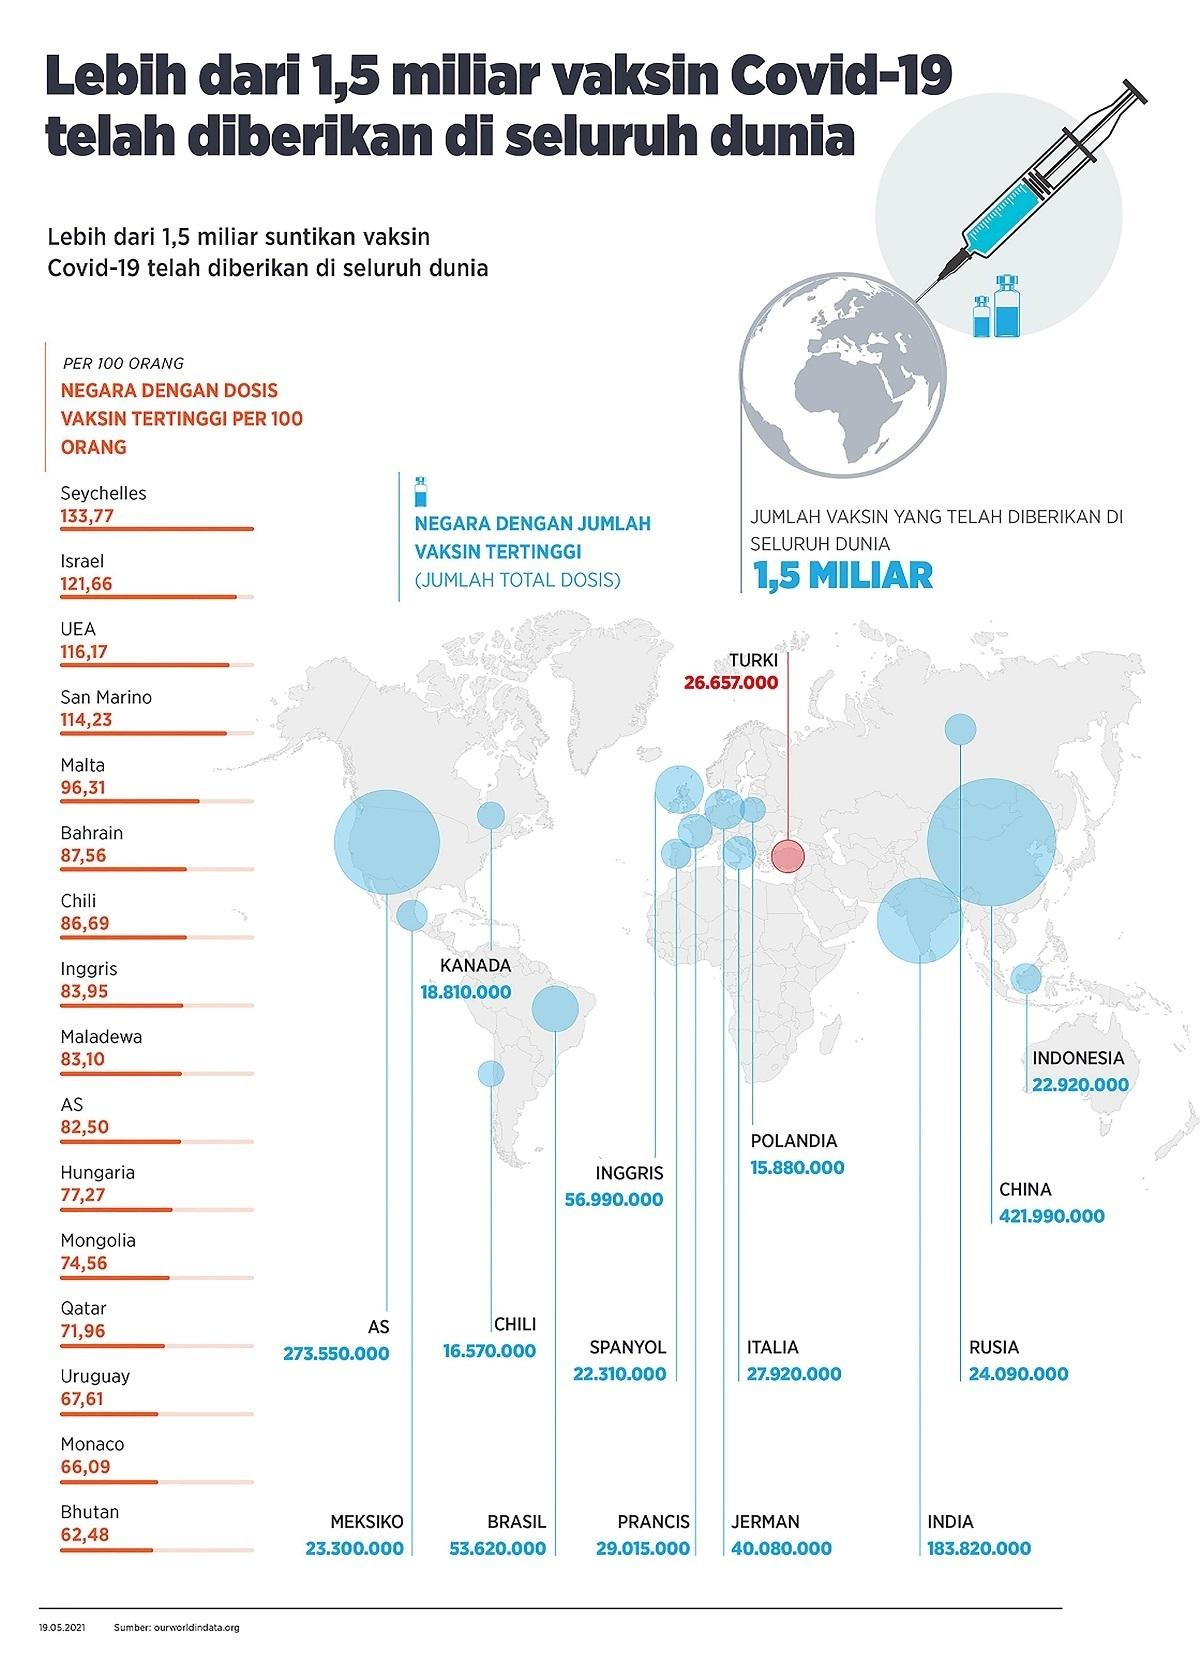 Lebih dari 1,5 miliar vaksin Covid-19 telah diberikan di seluruh dunia